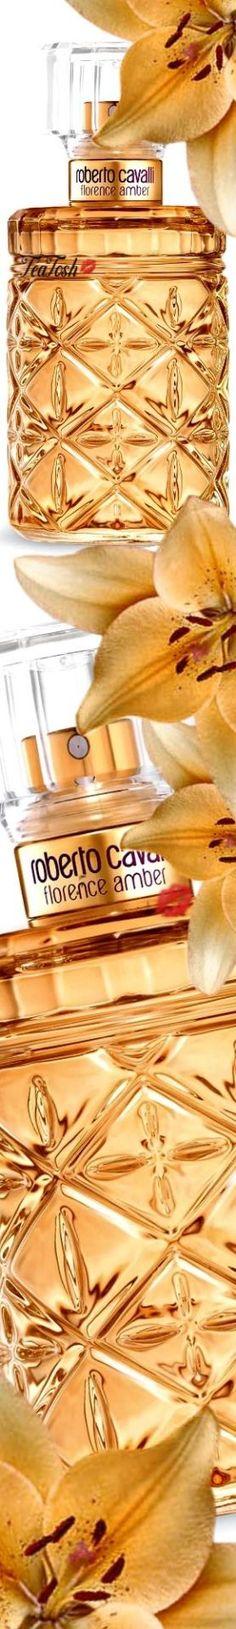 ❈Téa Tosh❈ Roberto Cavalli,  FLORENCE AMBER EAU DE PARFUM 75ML #RobertoCavalli #teatosh